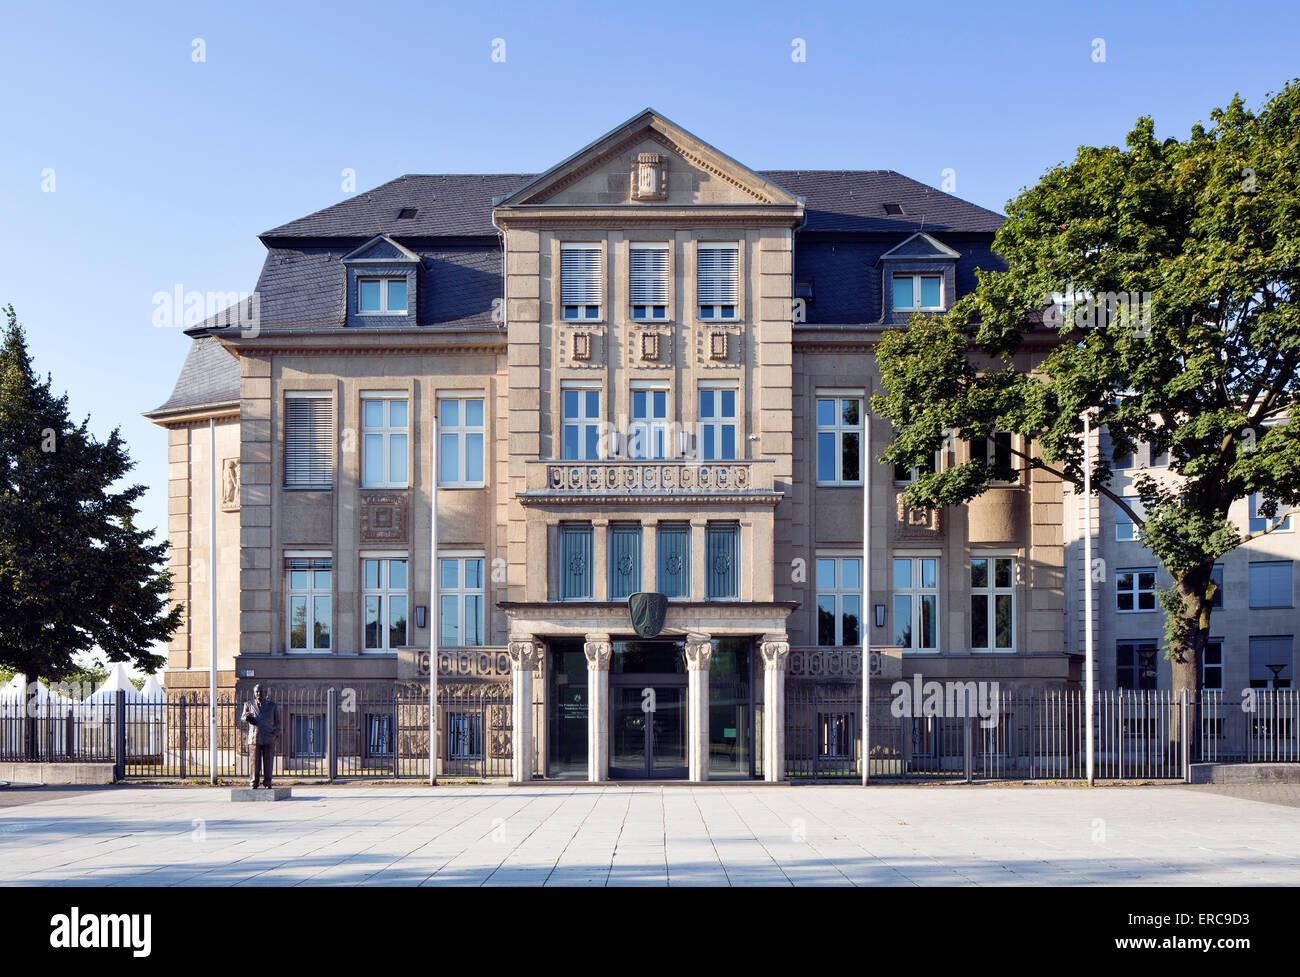 Villa Horion, former state chancellery, ministerial building, Düsseldorf, Rhineland, North Rhine-Westphalia, - Stock Image